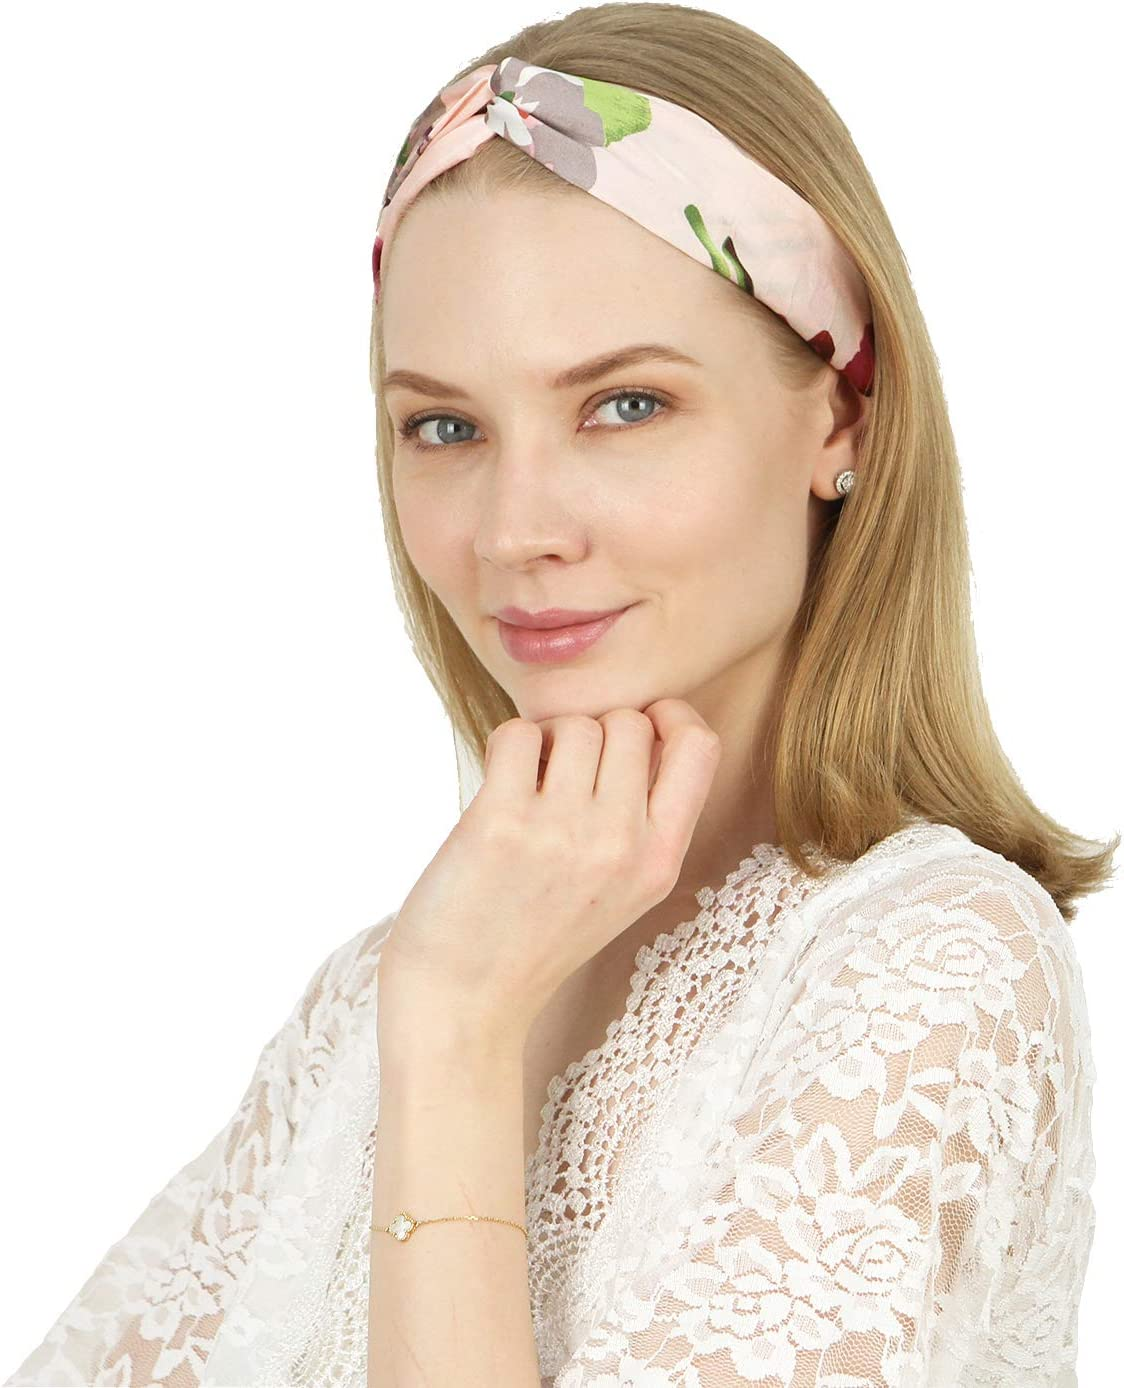 Folora 4pcs Vintage Twisted Criss Cross Elastic Headbands Soft Silk Floral Bohemia Hair Bands for Women Girls